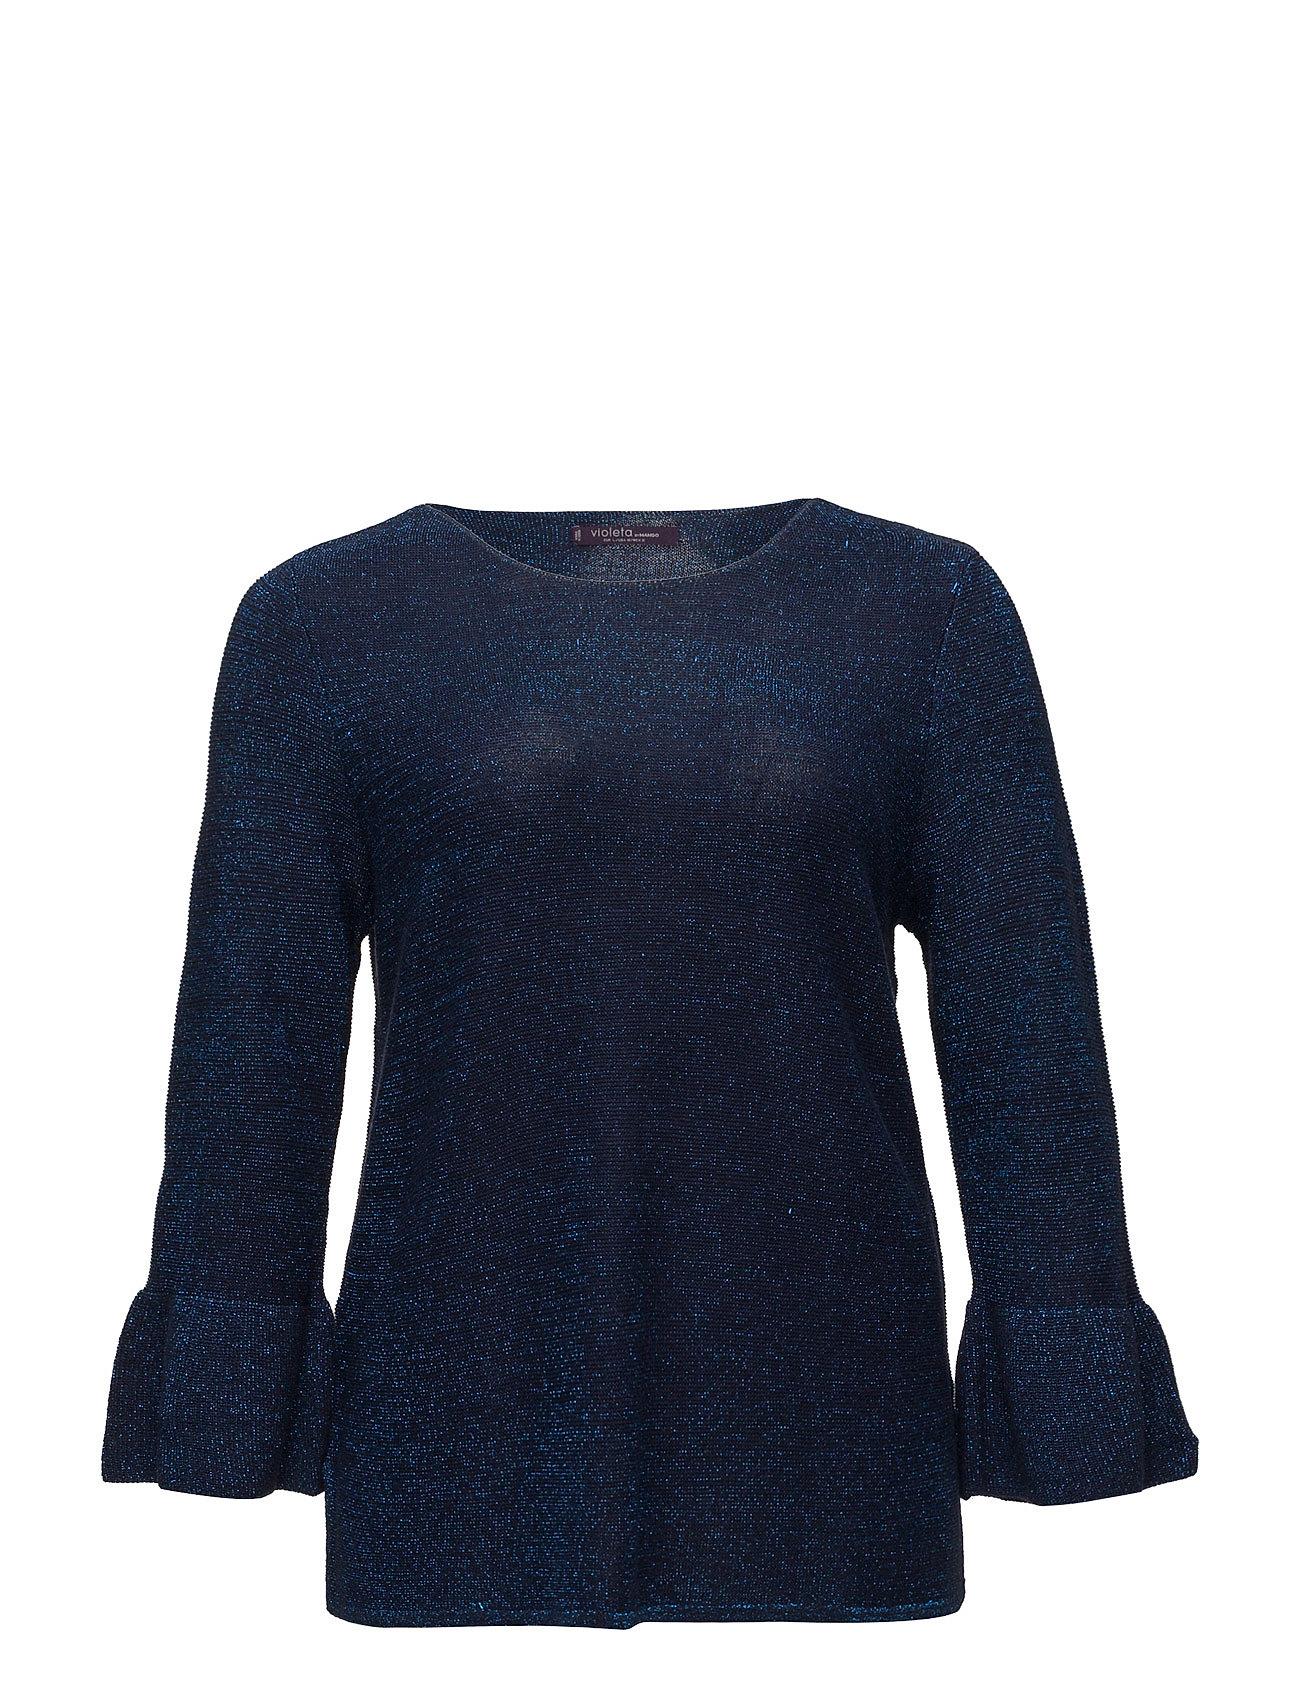 Ruffled Metallic Sweater Violeta by Mango Sweatshirts til Damer i Medium Blå